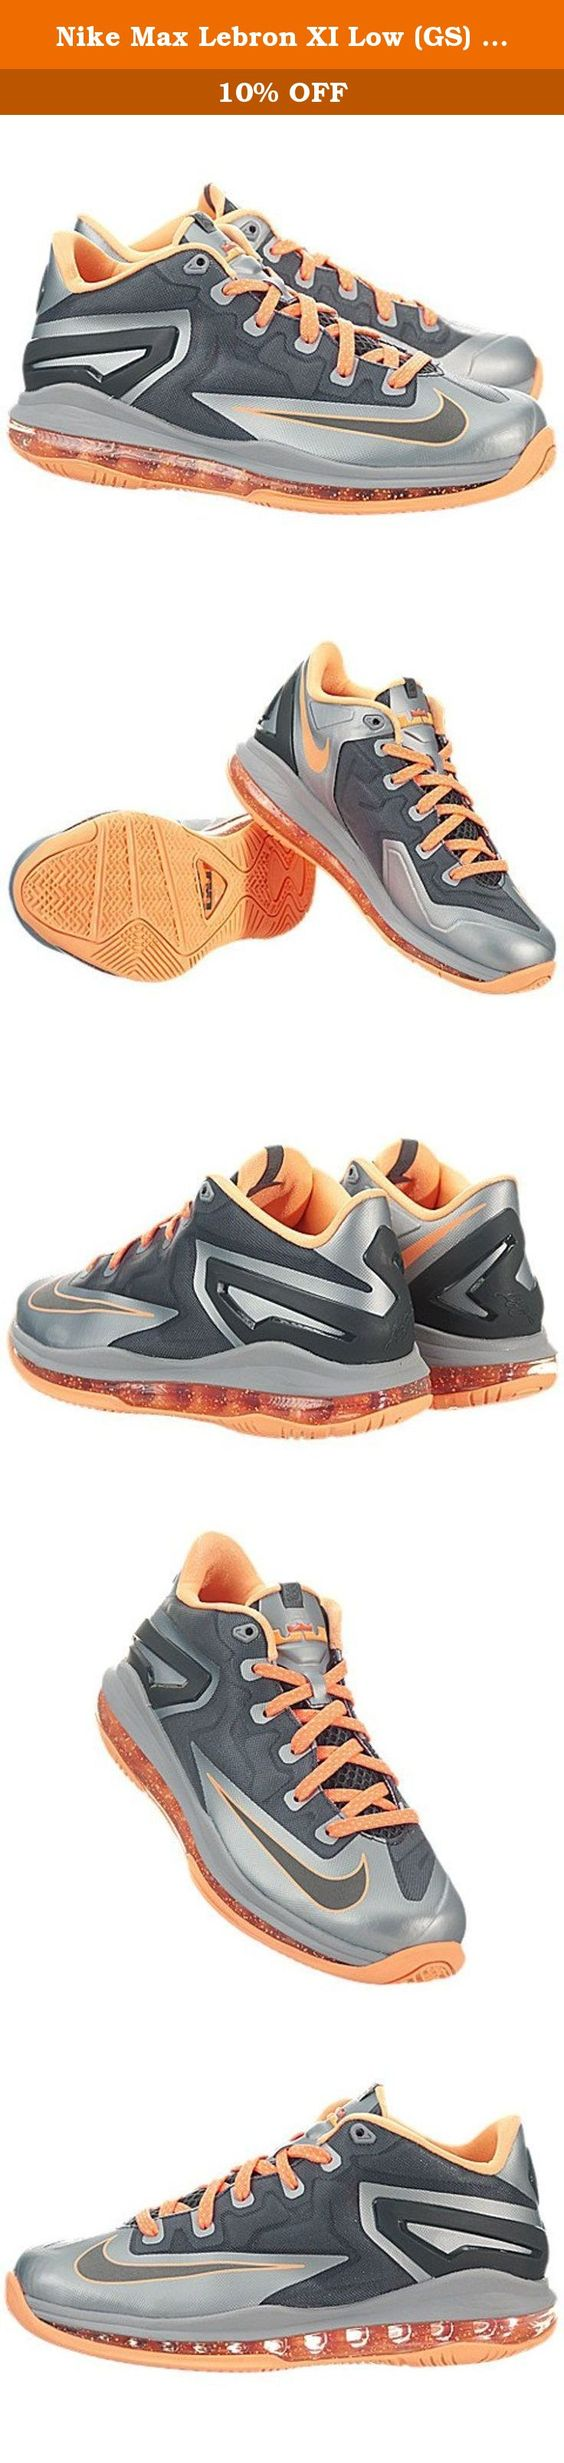 half off c11c4 44b7f ... nike max lebron xi low (gs) kids sneakers magnet grey bright .